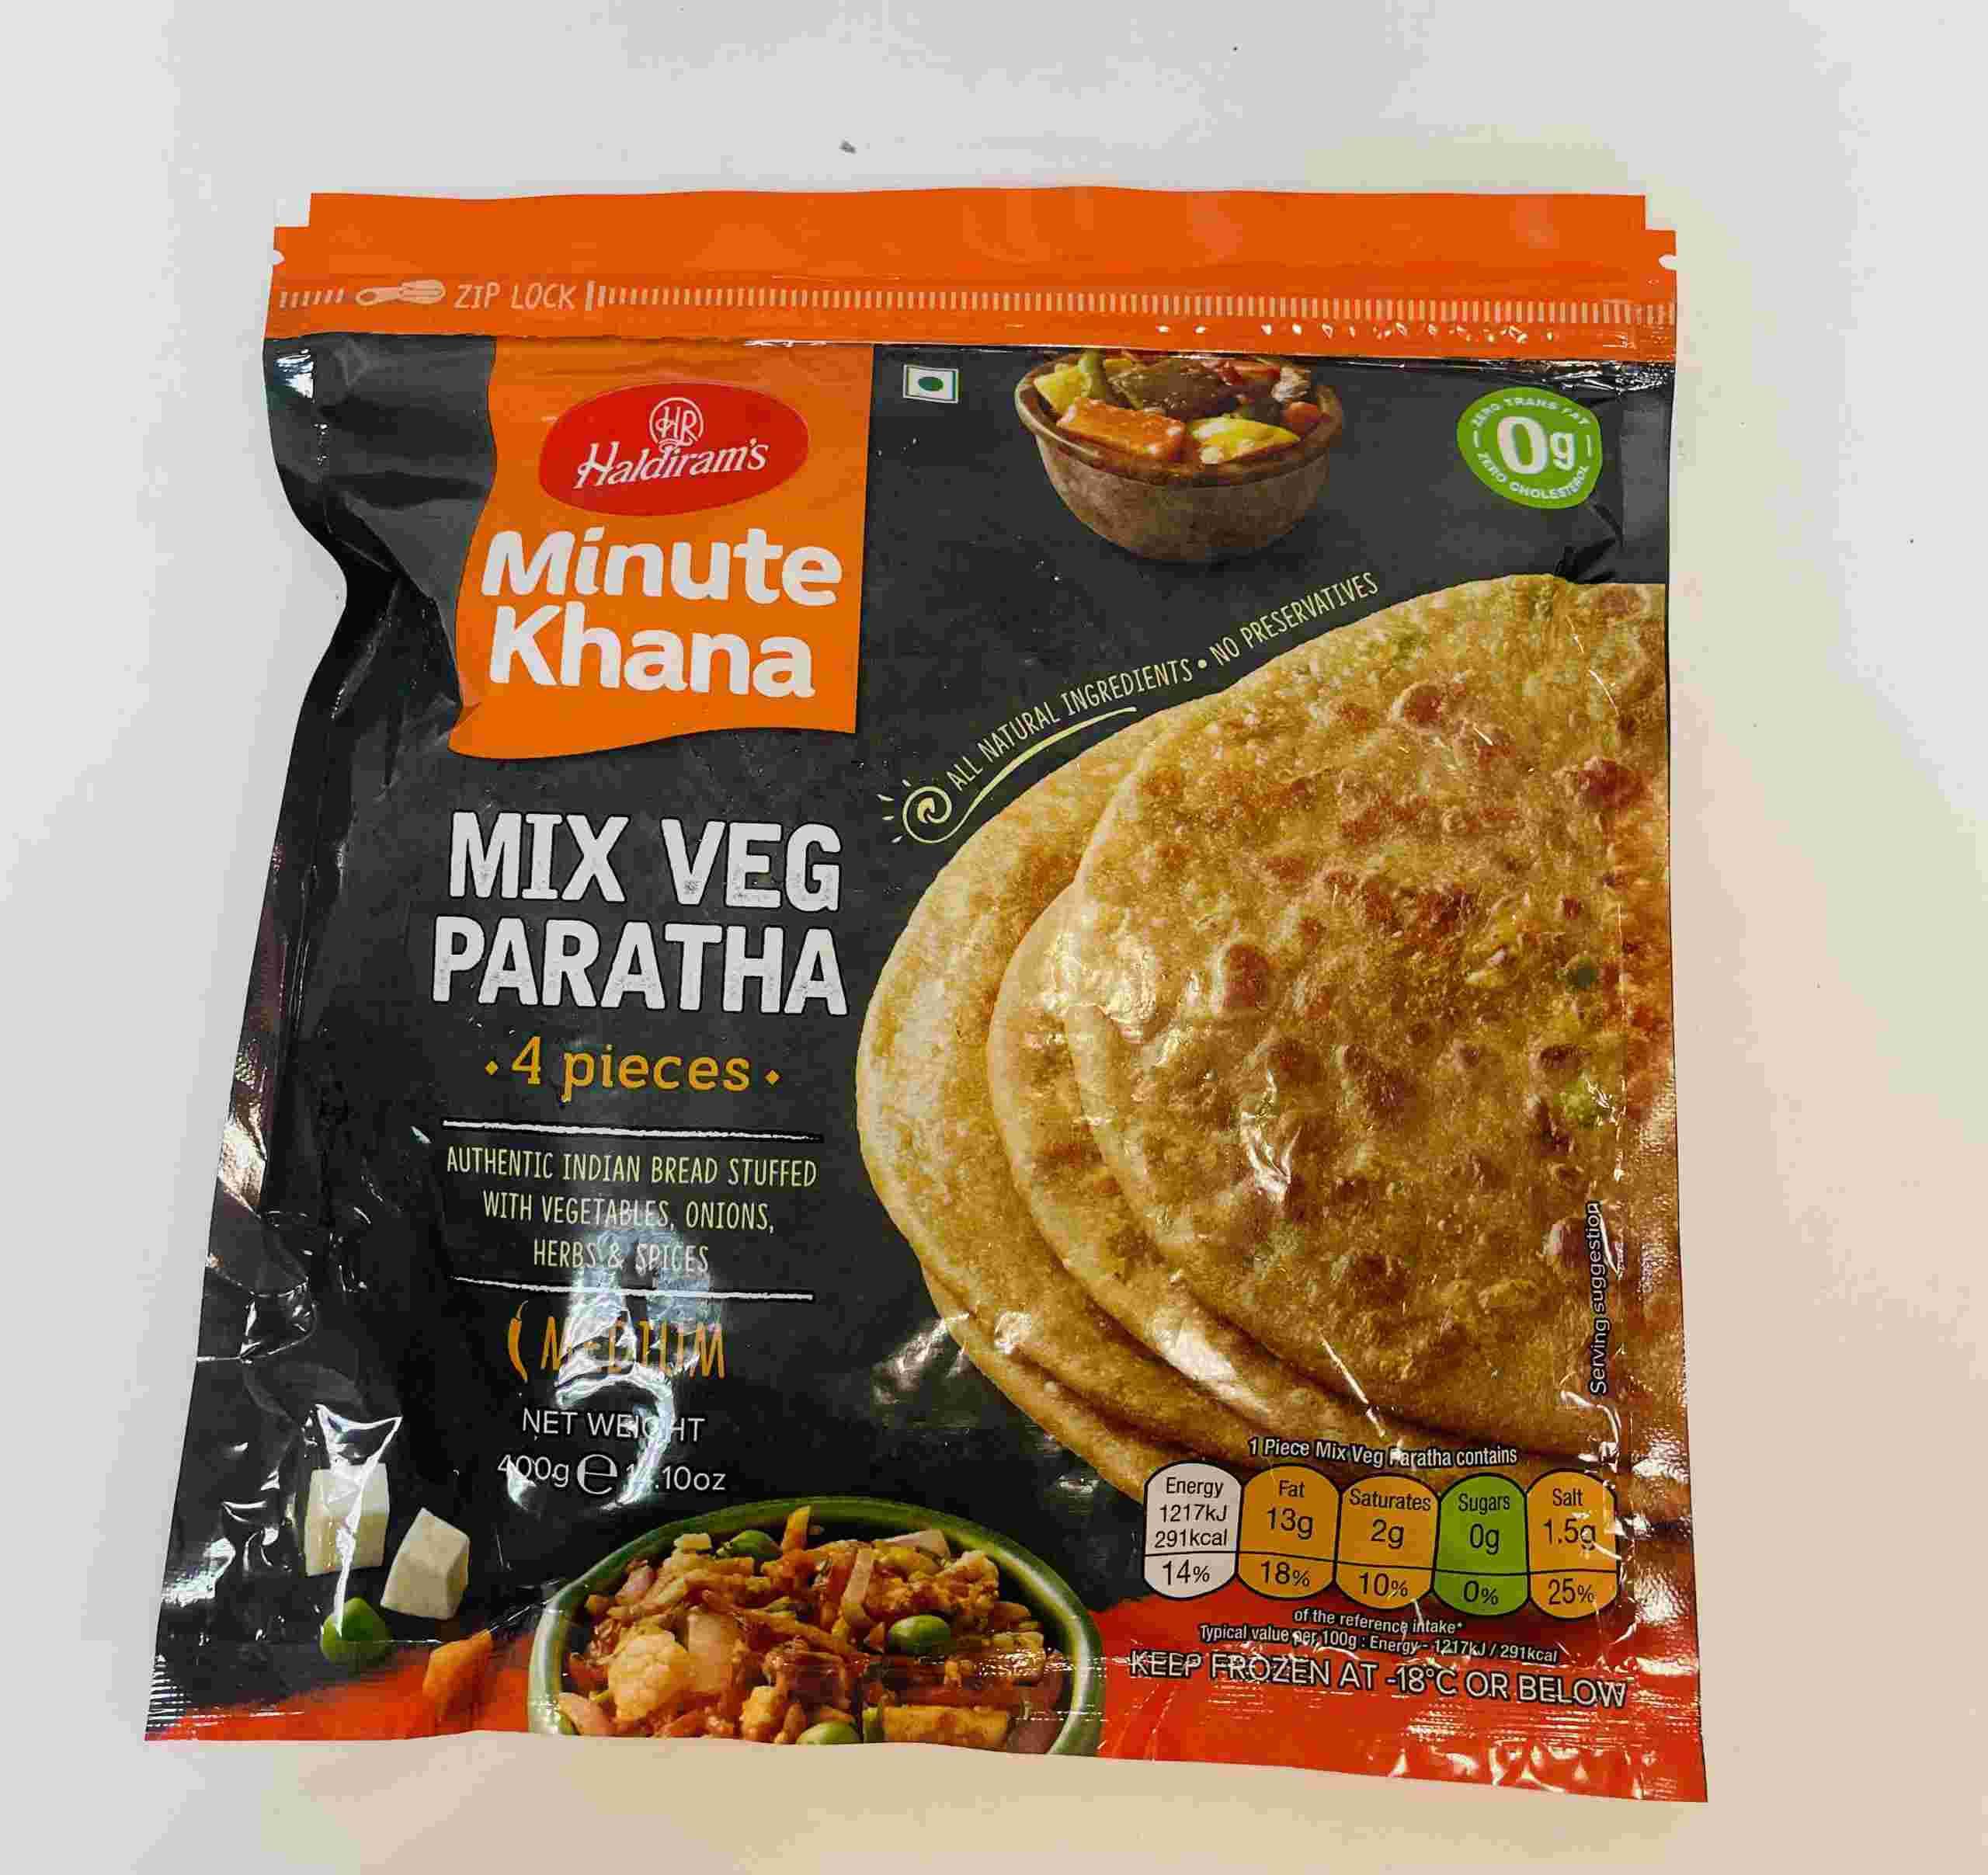 Haldiram's Mix Veg Paratha 4 Pieces